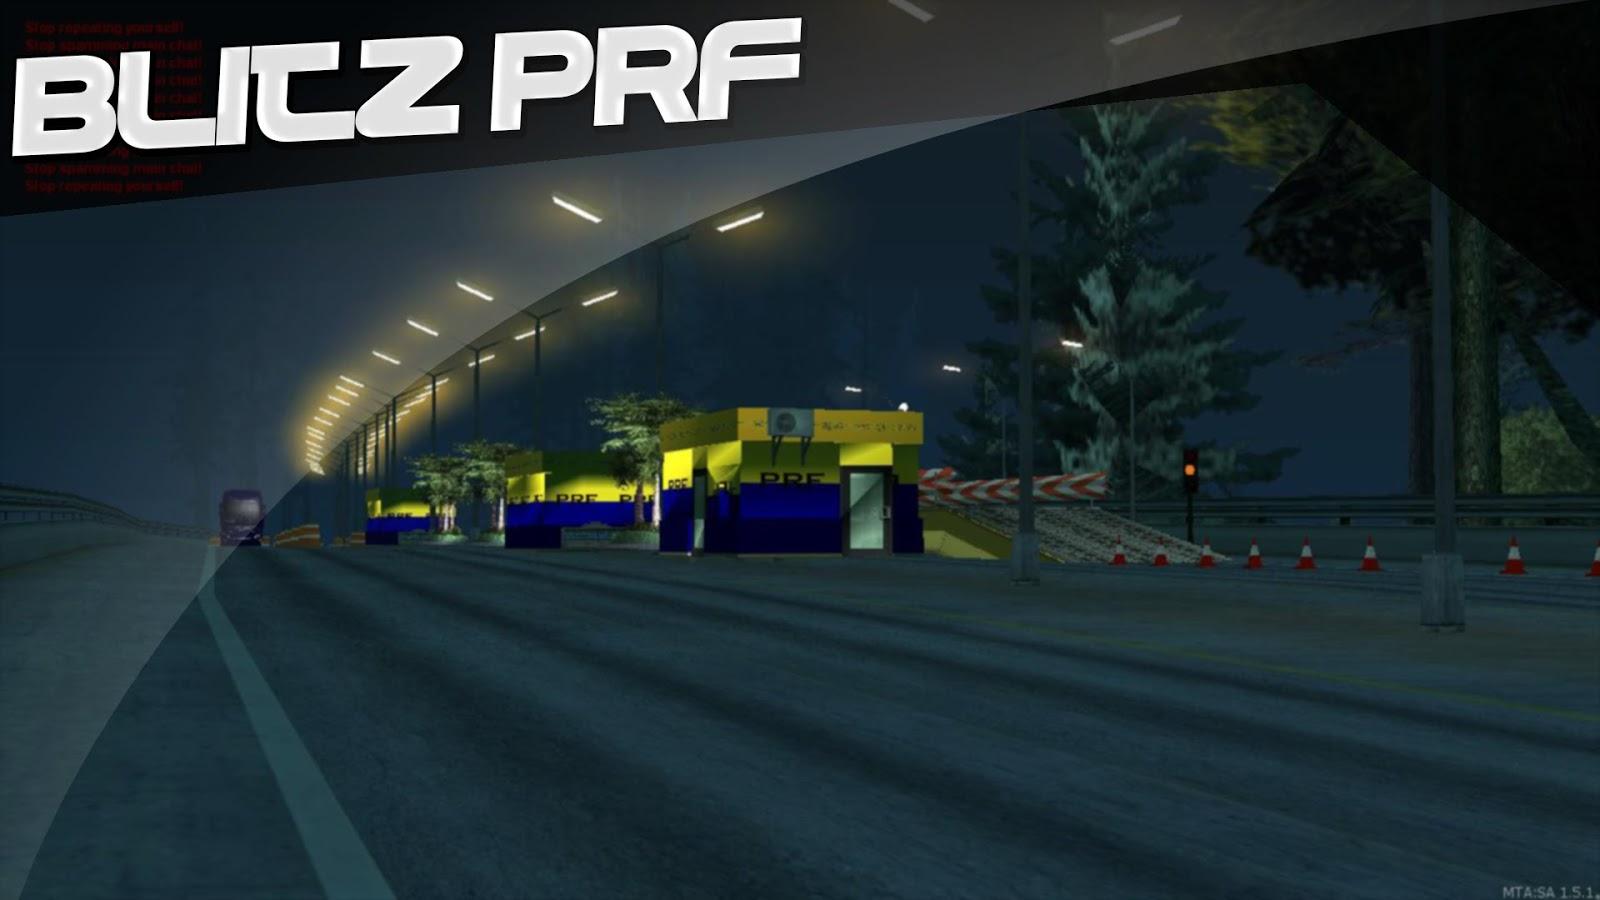 Gta 5 online novo carro freecrawler natildeo lanccedilado test039s 597000 - 4 8